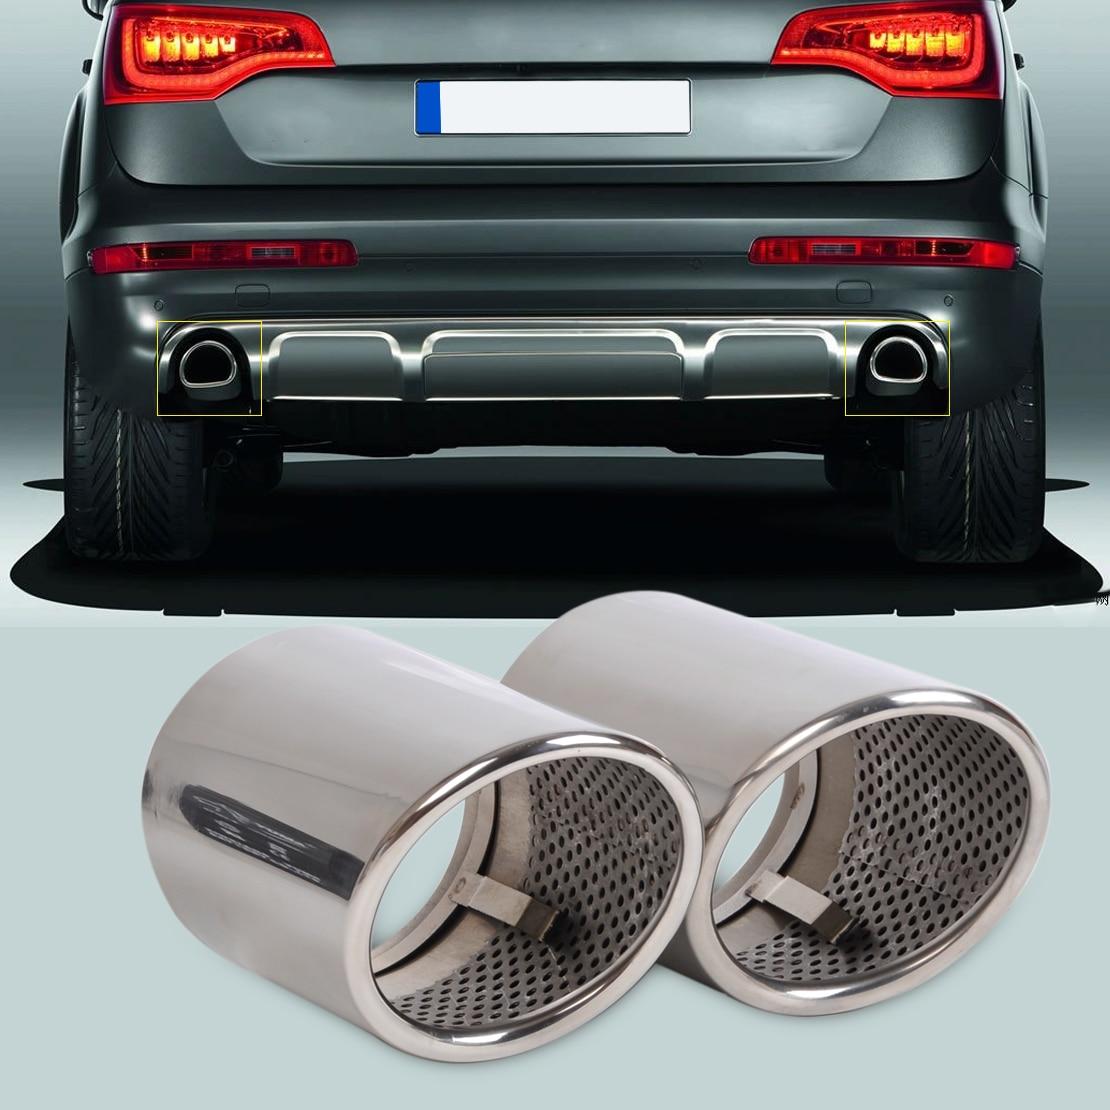 beler 2pcs Chrome Stainless Steel Exhaust Tail Rear Muffler Tip Pipe for Audi Q7 3.0 TDI TFSI 2006 2007 2008 2009 2010-2013